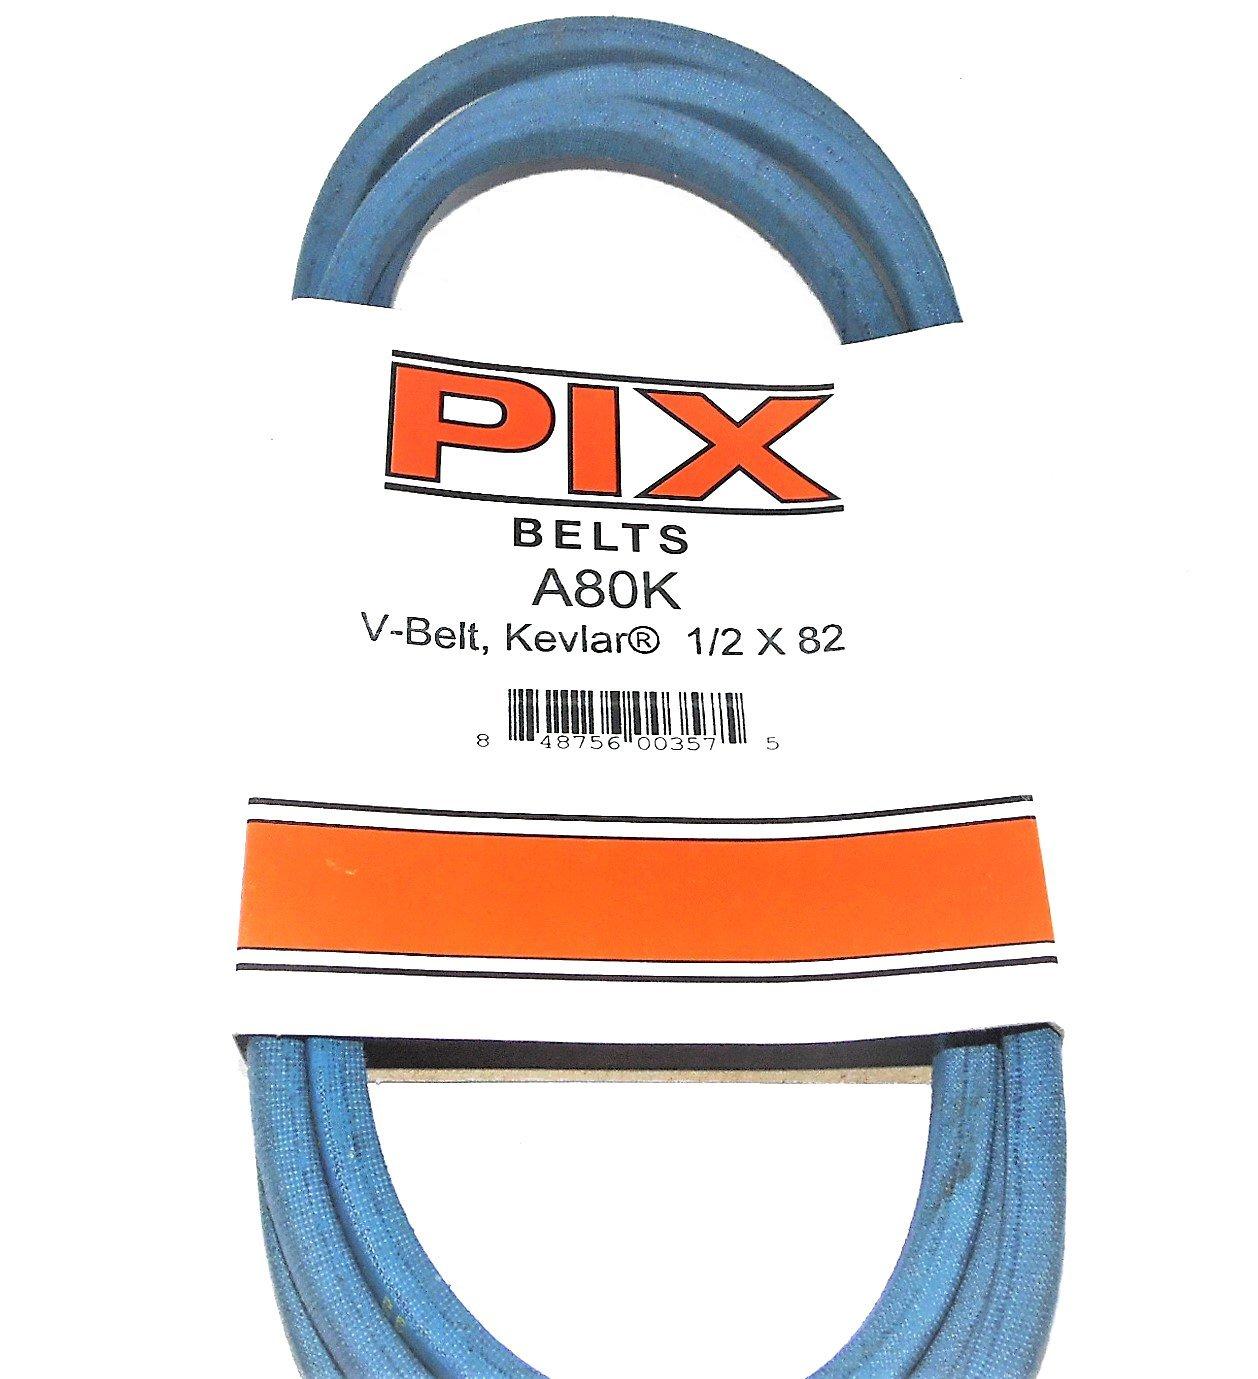 "KEVLAR wrapped Industrial & Lawn Mower Belt A80K 4L820K 1/2 X 82"" HEAVY DUTY --P#EWT43 65234R3FA539899"